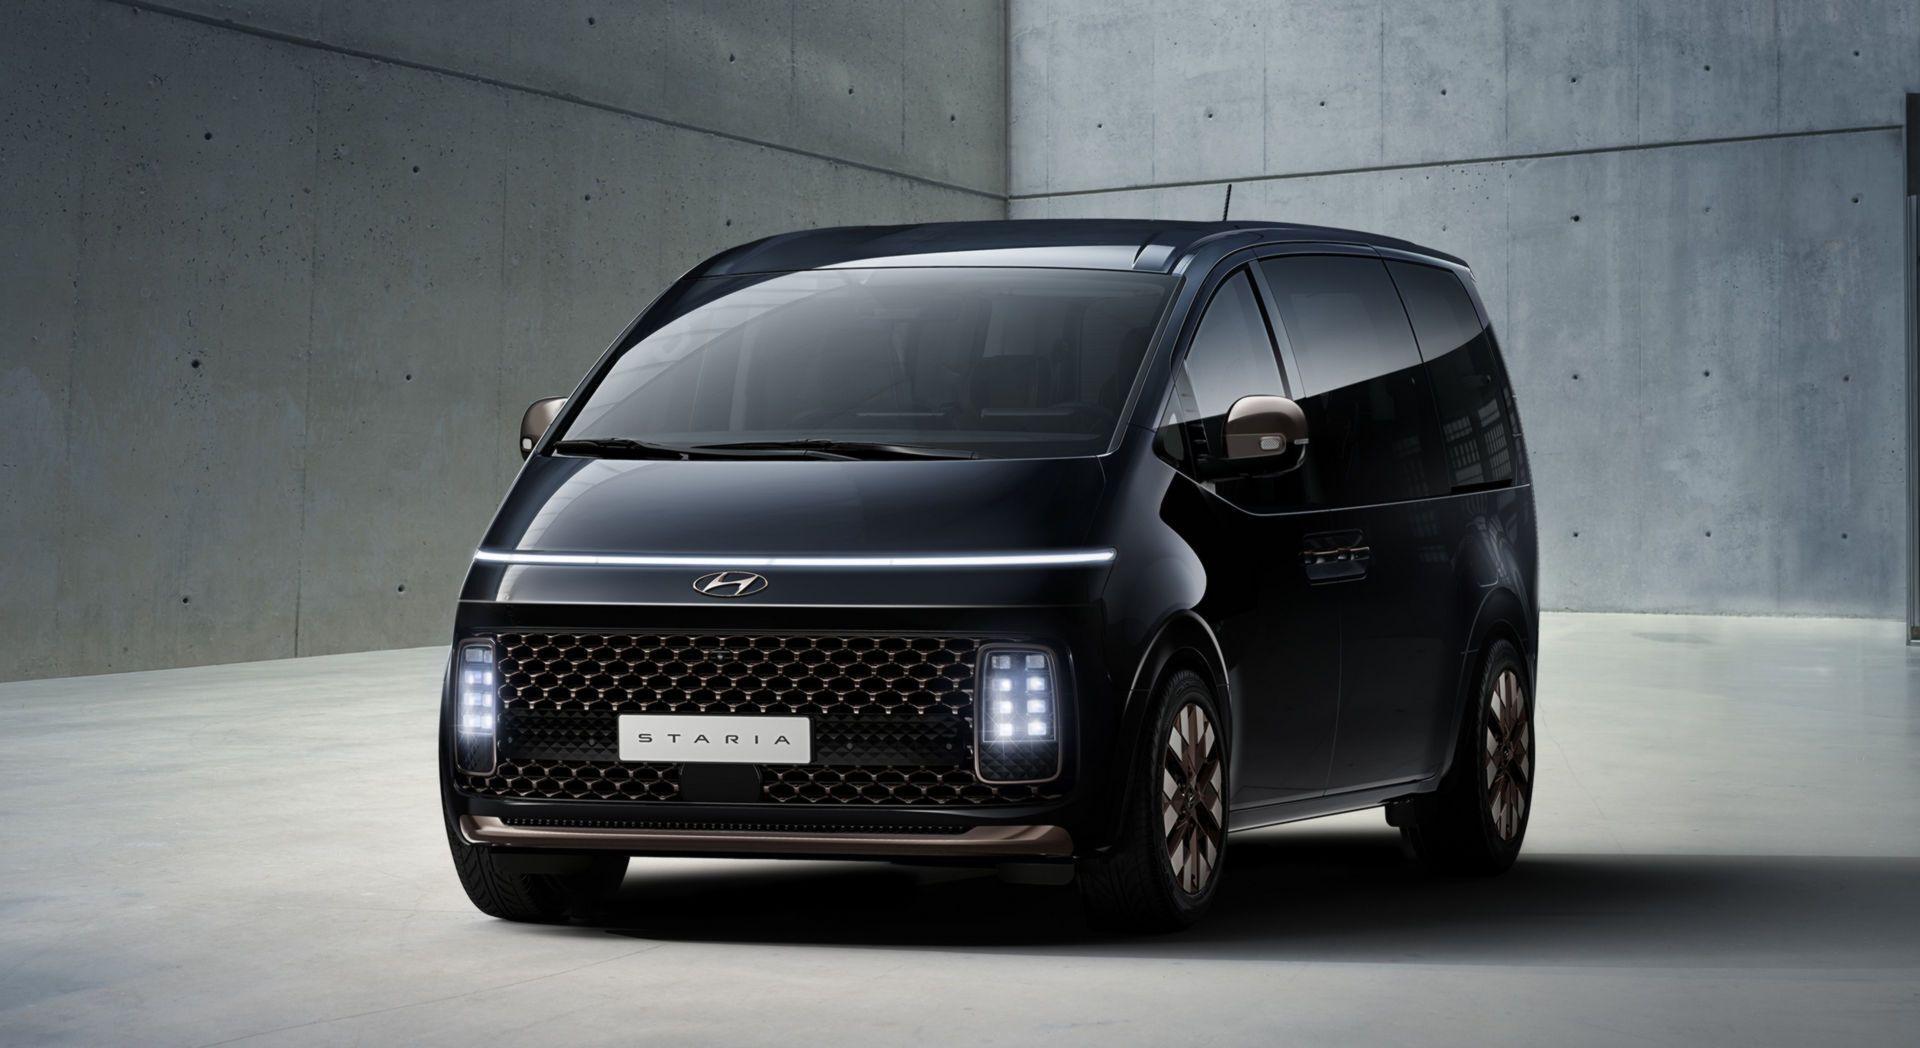 Hyundai Staria сменит на конвейере семейство вэнов Hyundai H-1/Starex